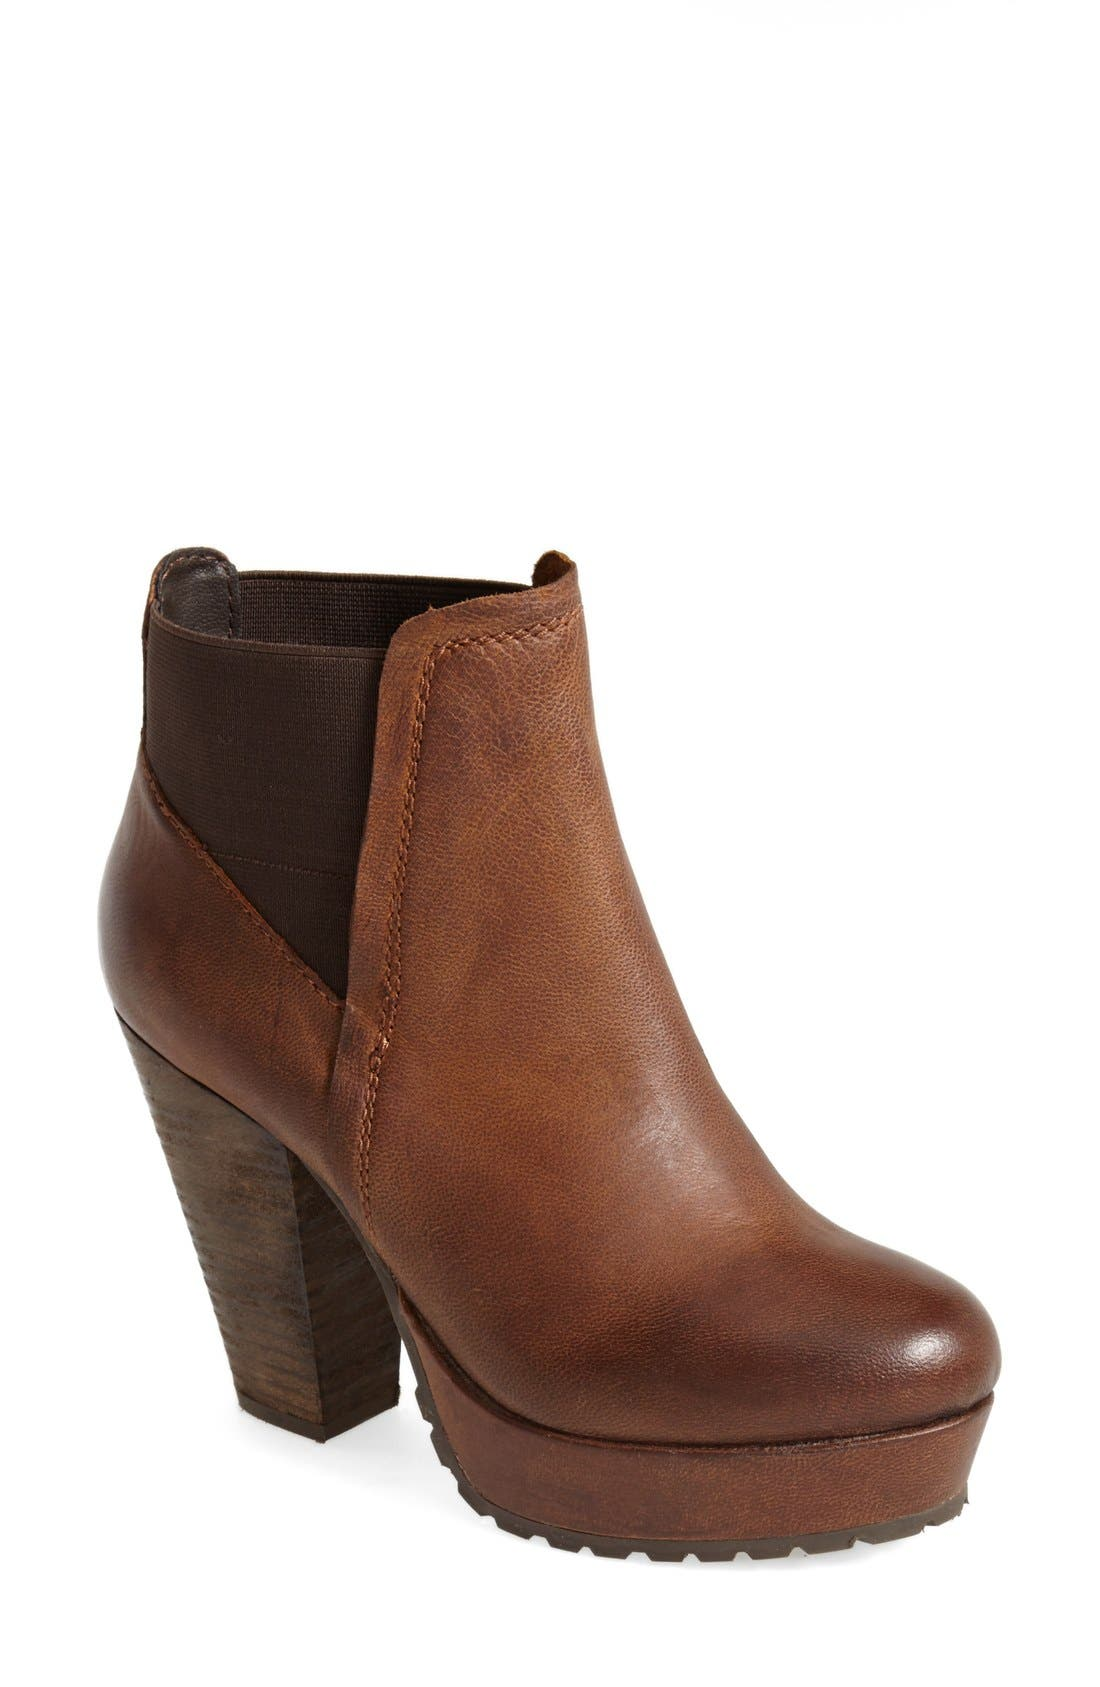 Main Image - Steve Madden 'Randaal' Leather Platform Bootie (Women)